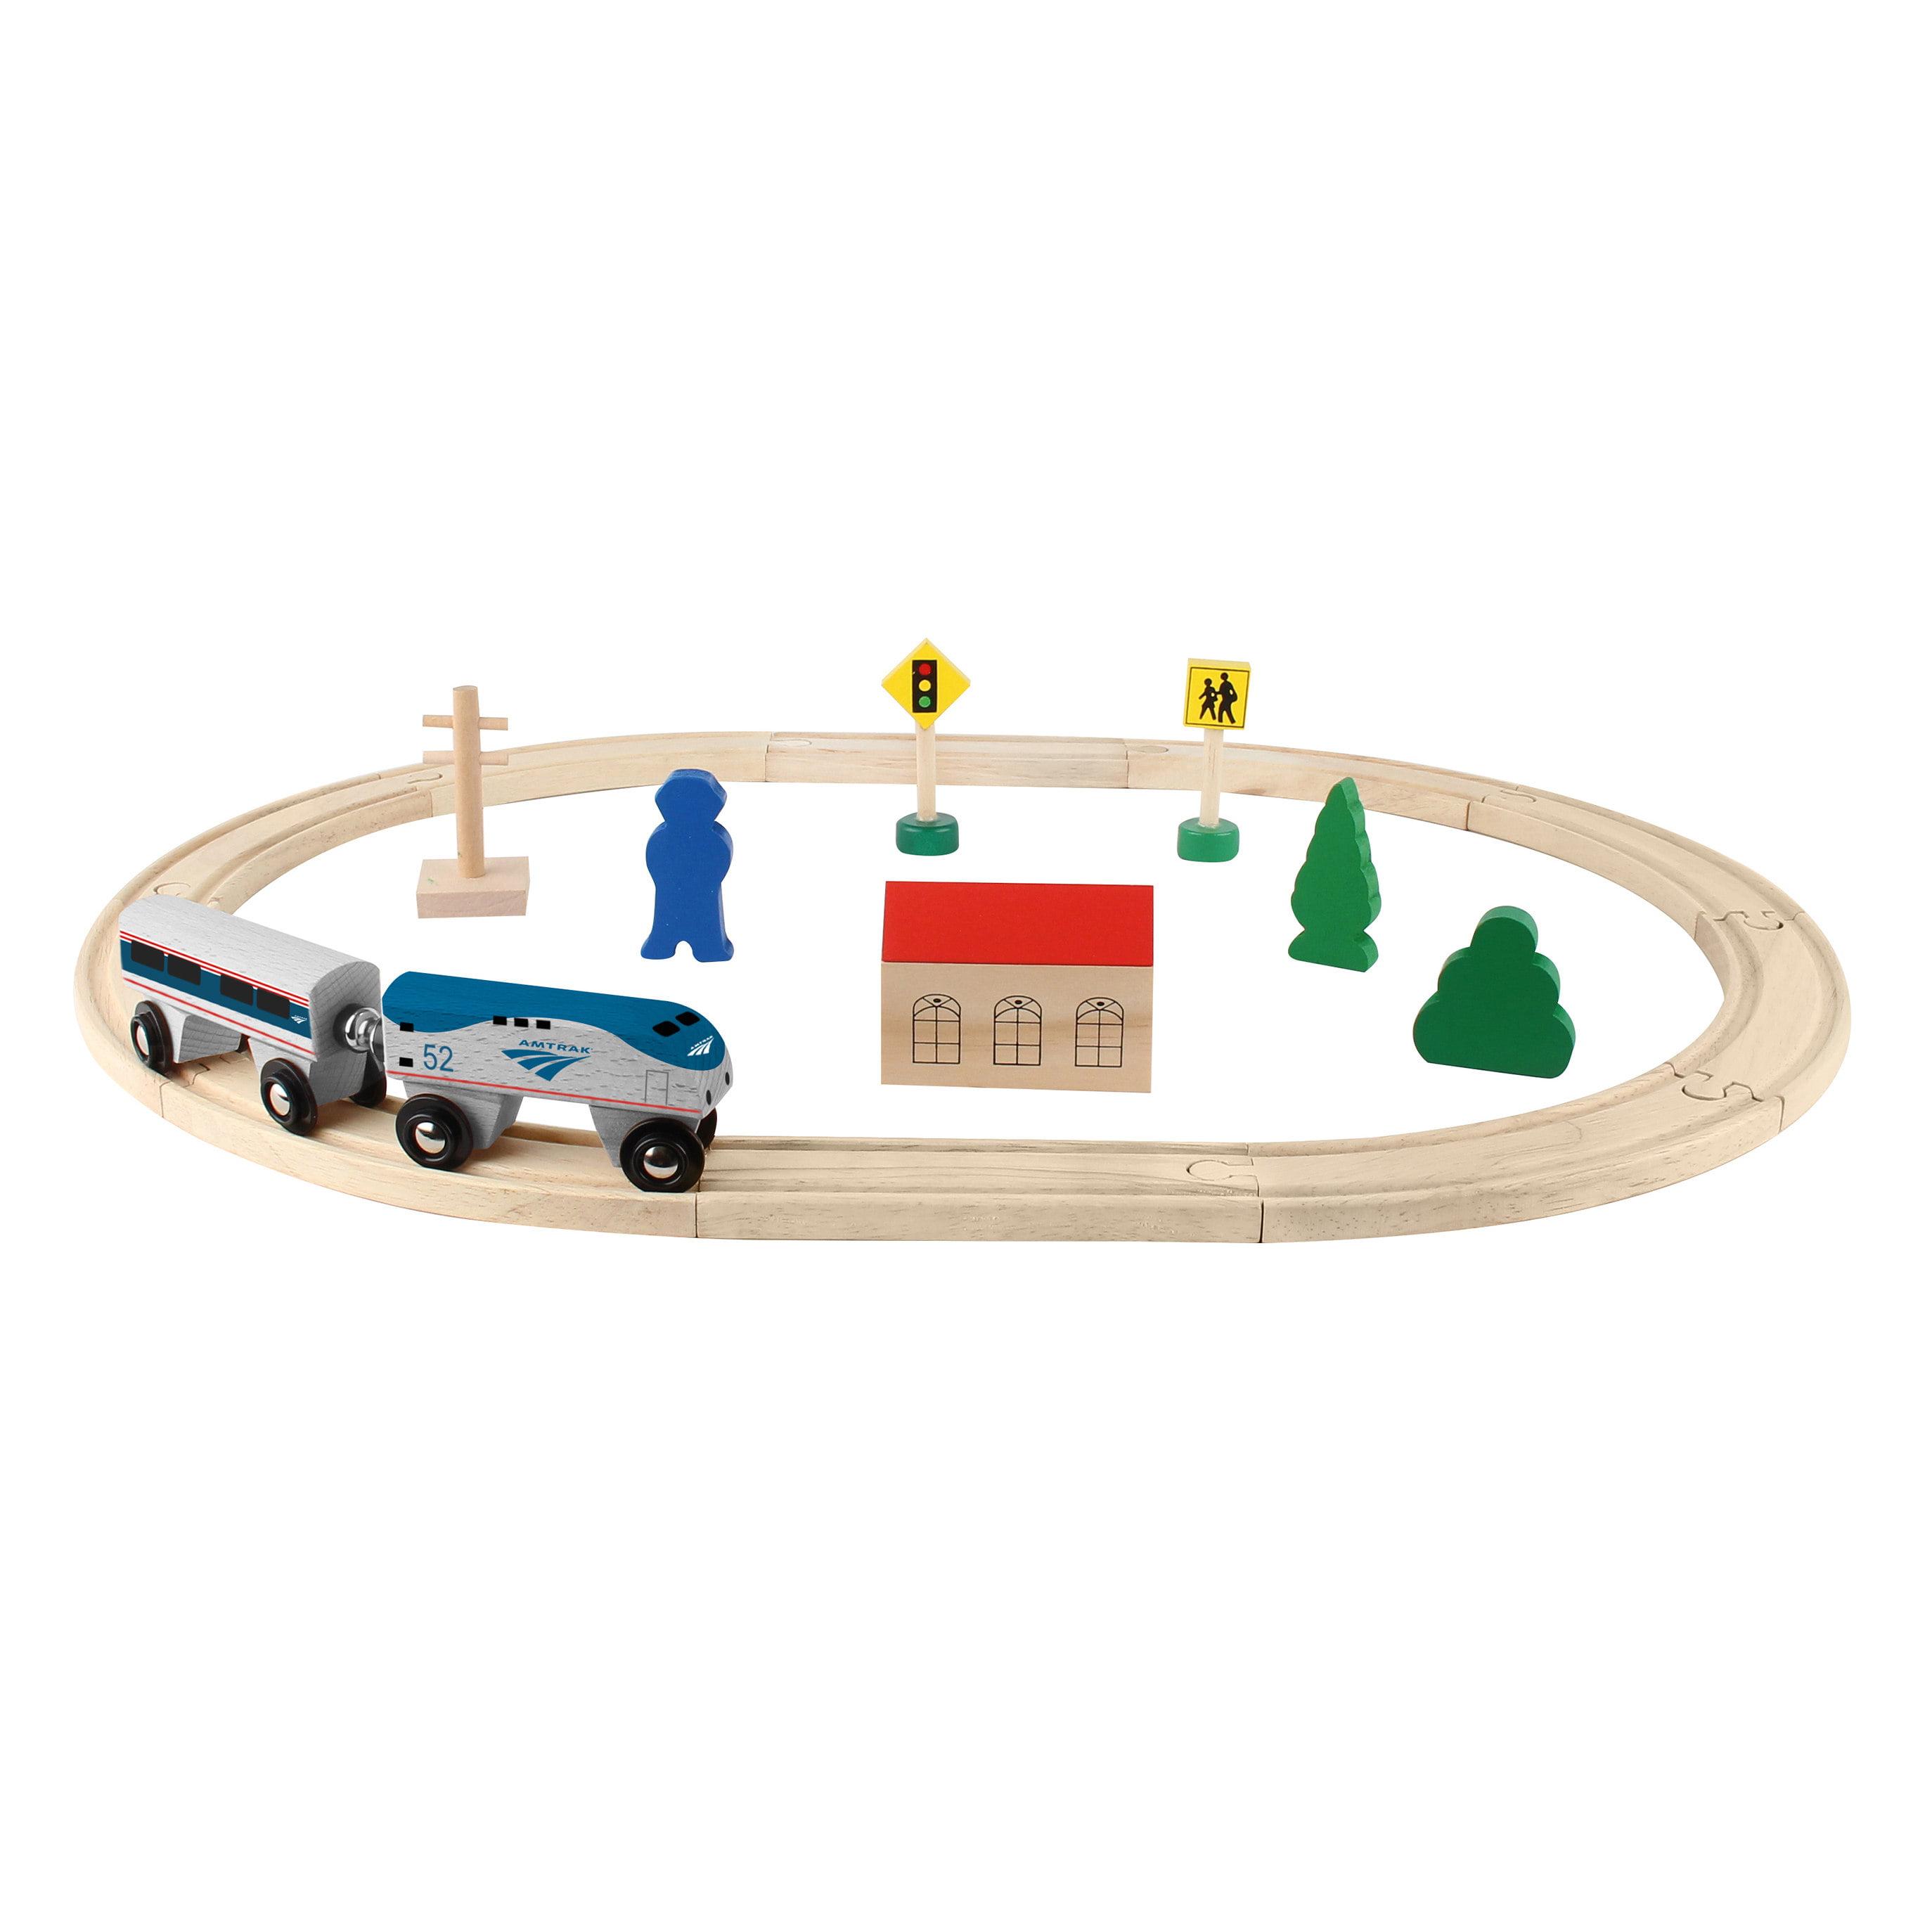 Daron Amtrak Wooden Train Set 20 pieces by Daron